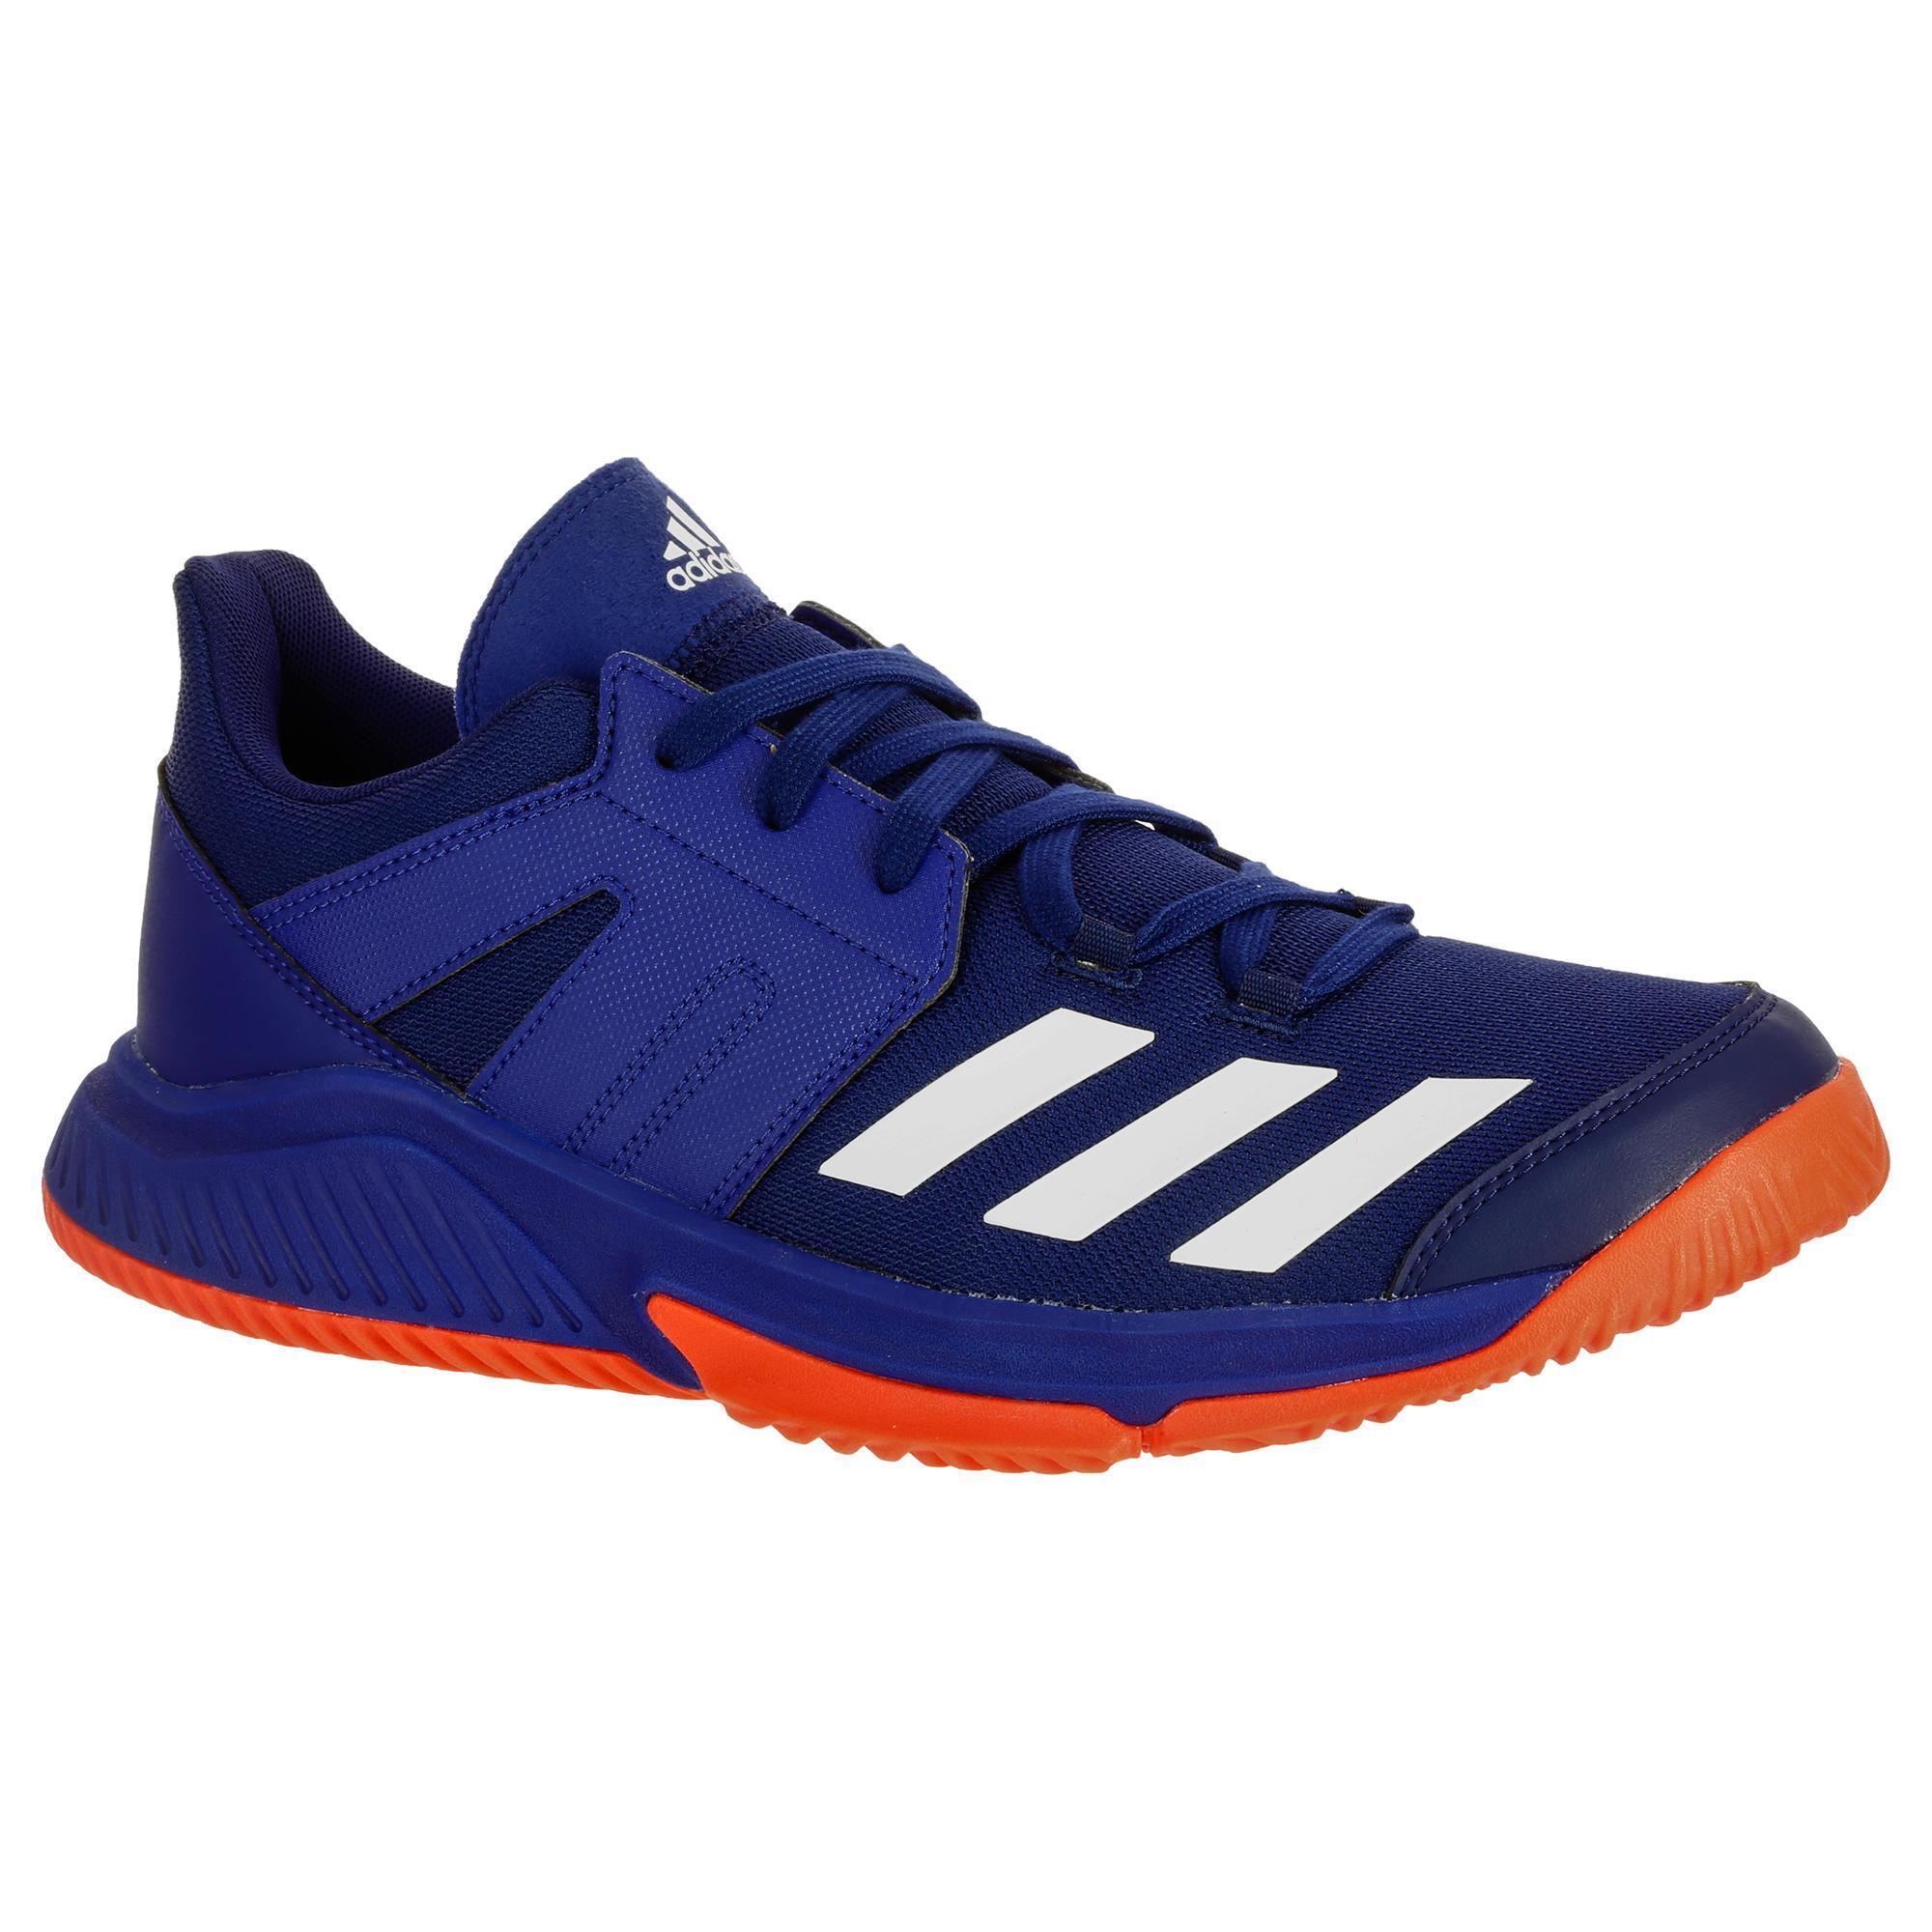 Handballschuhe Essence Erwachsene blau/rot   Schuhe > Sportschuhe > Handballschuhe   Adidas